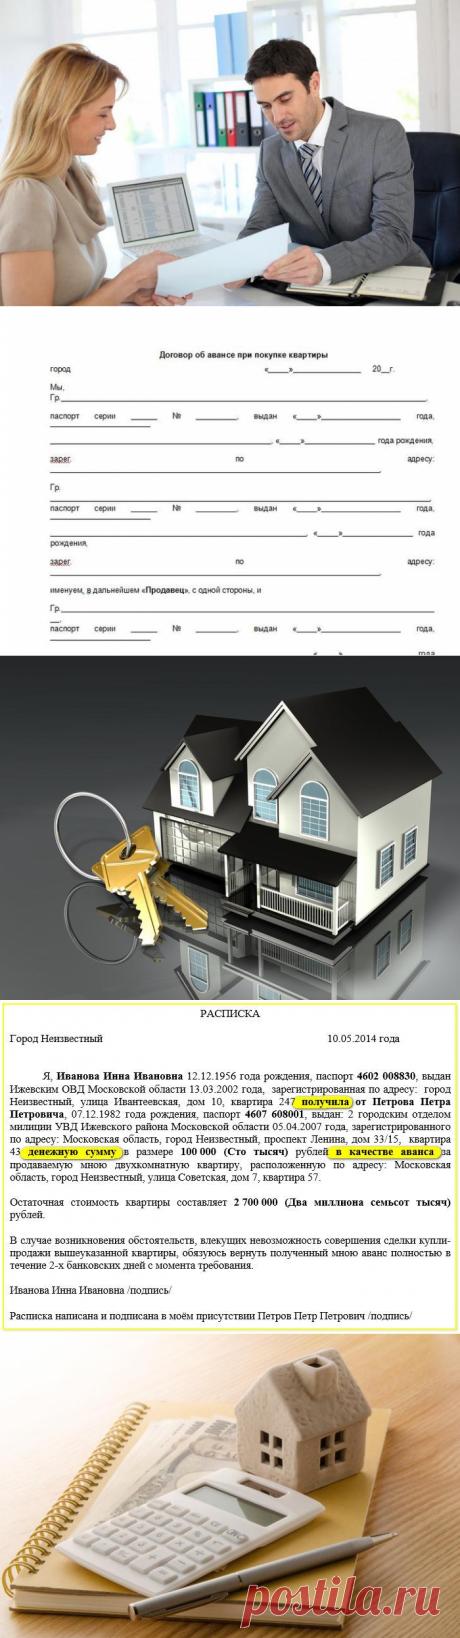 Соглашение об авансе при продаже недвижимости: образец